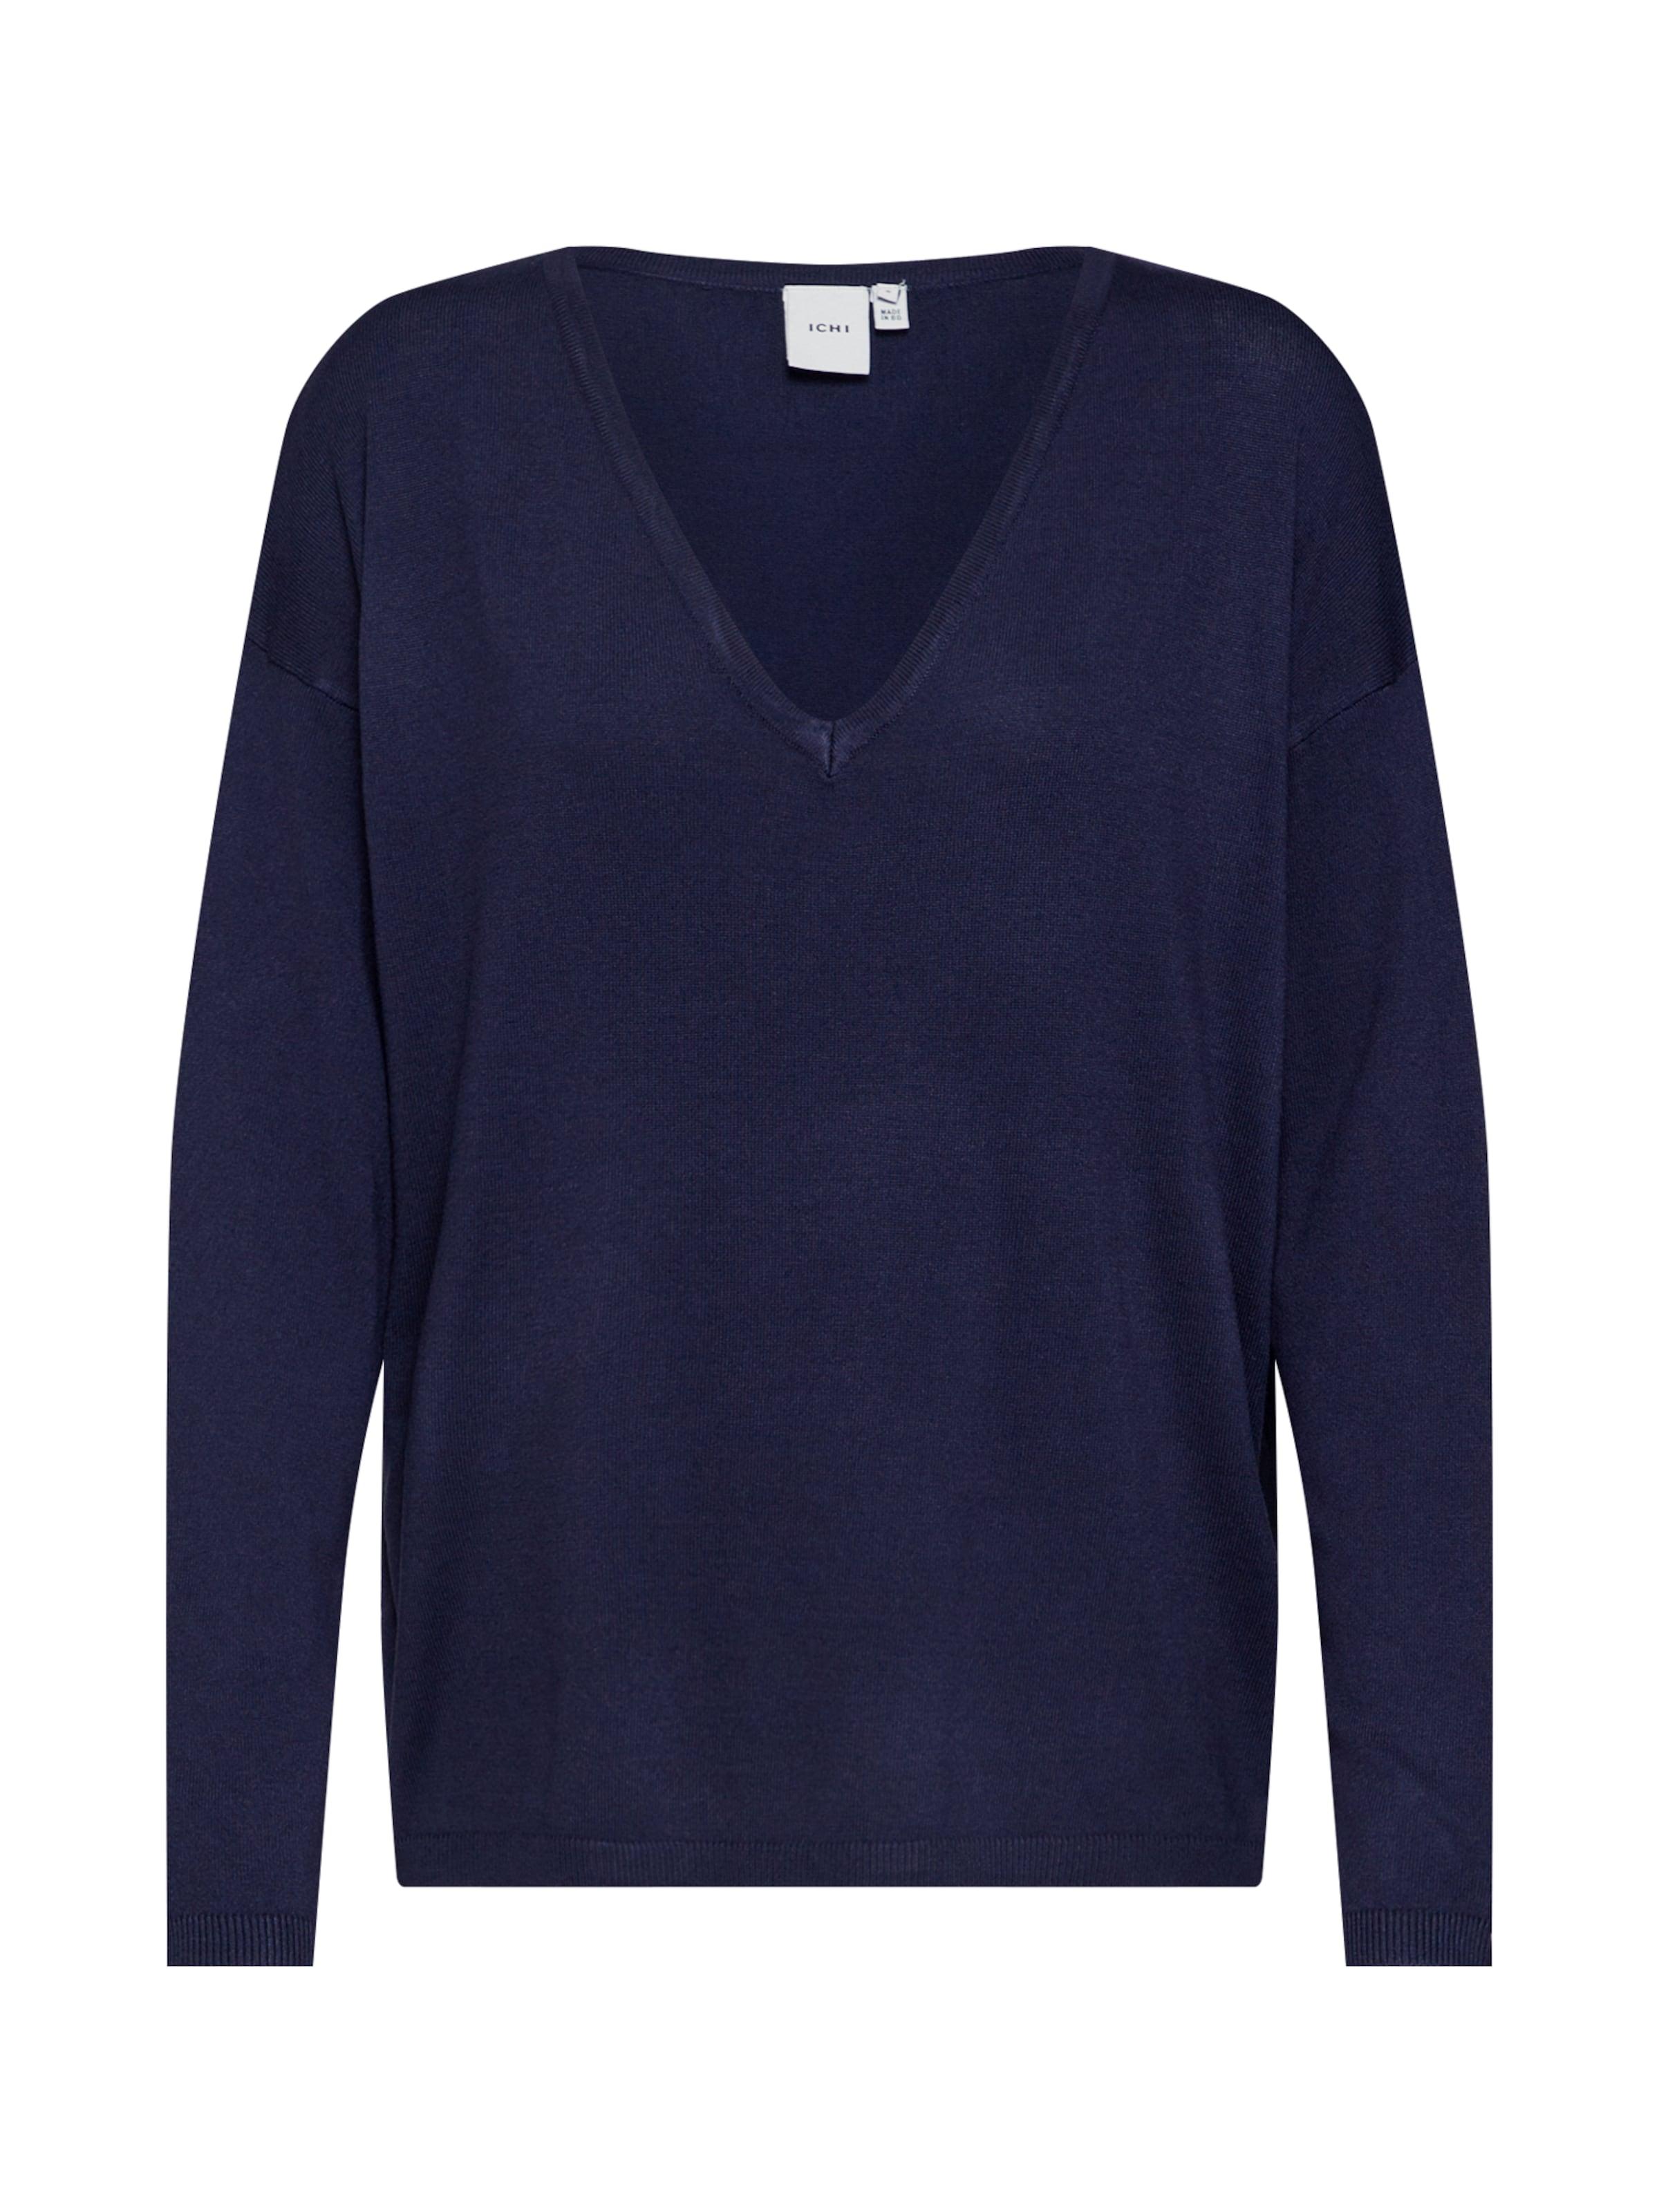 Ls2' Blau V Ichi 'mafa Pullover In ordCxBe